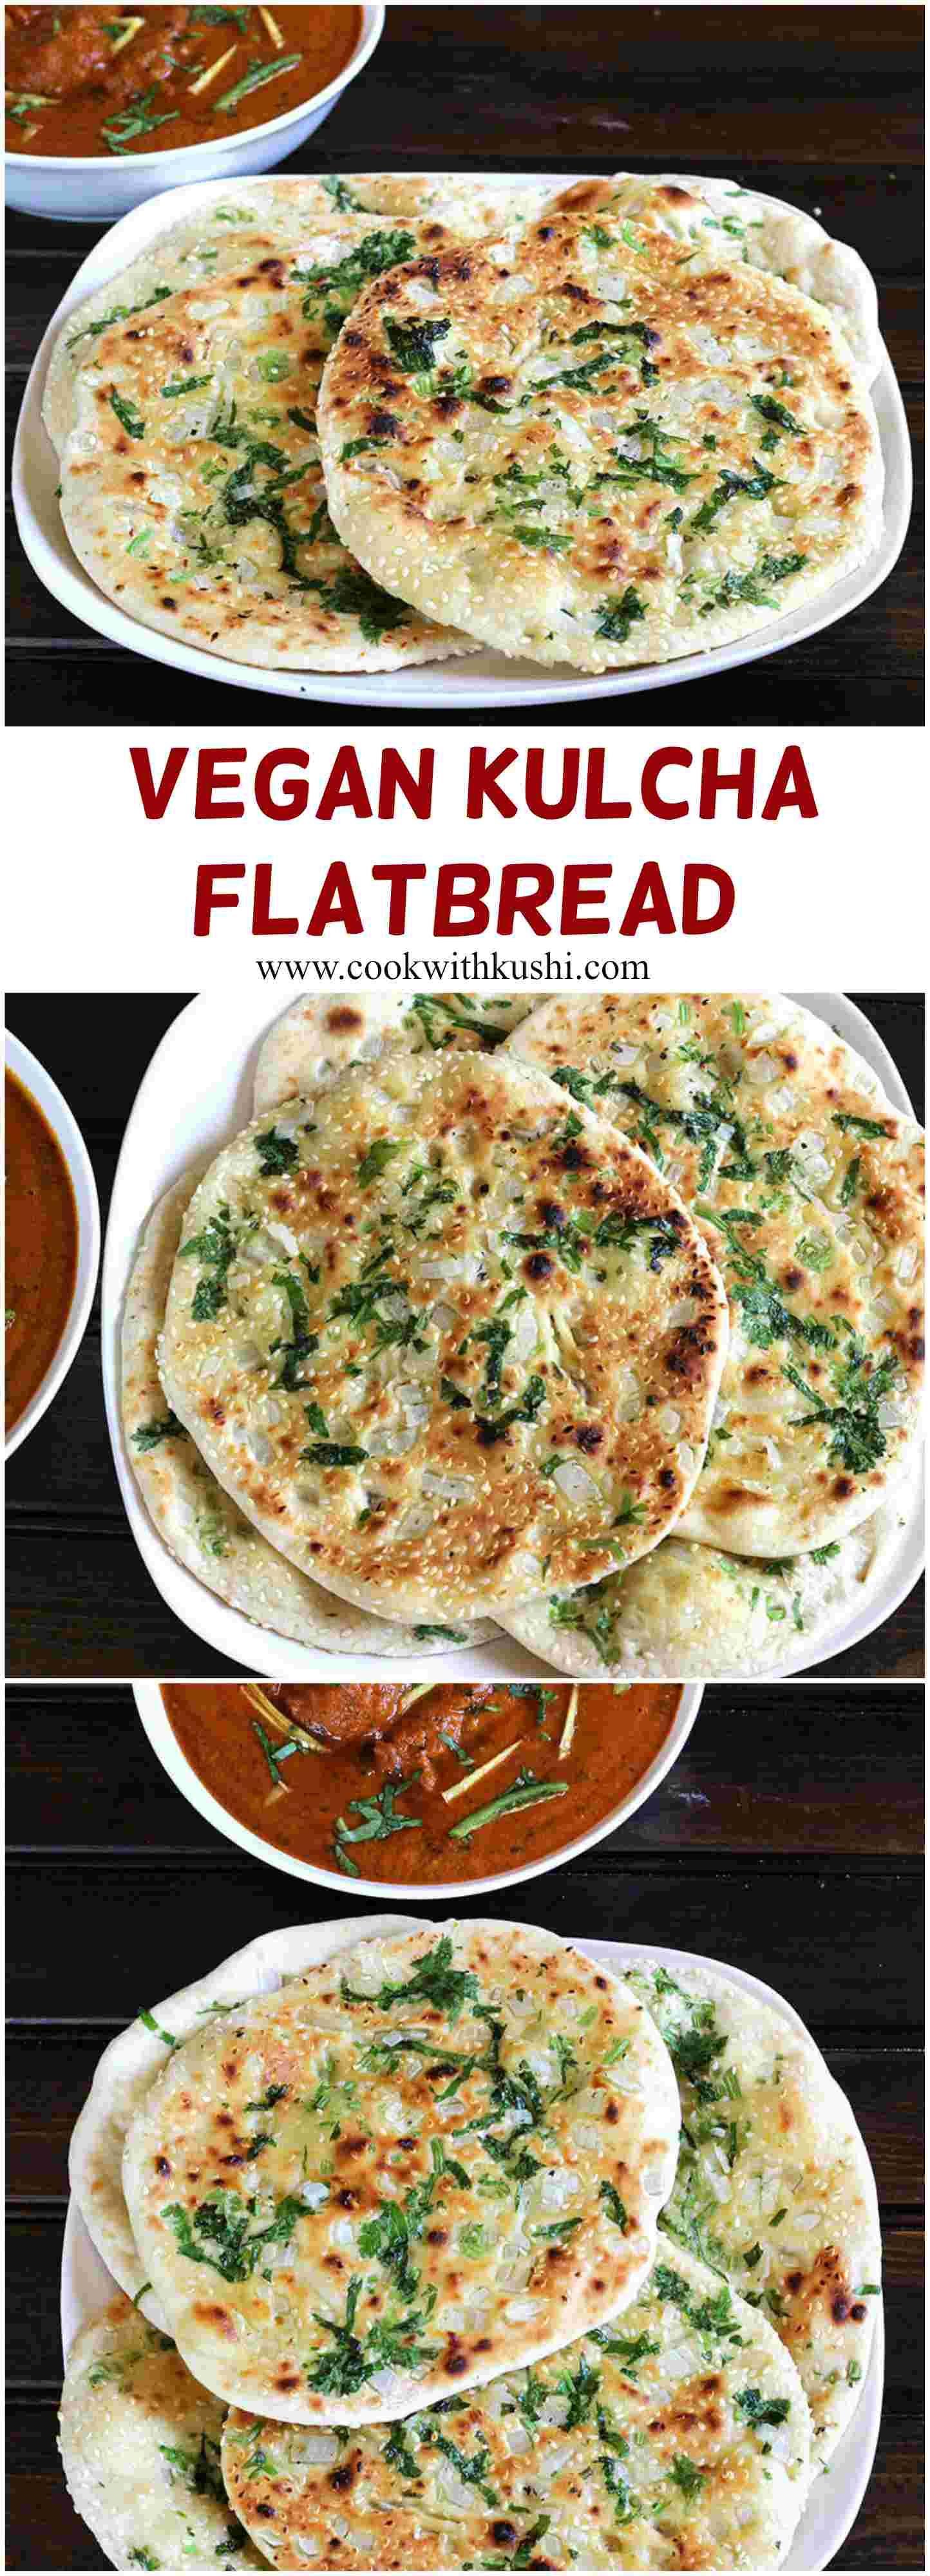 KULCHA Indian food recipes, Vegetarian recipes, Food